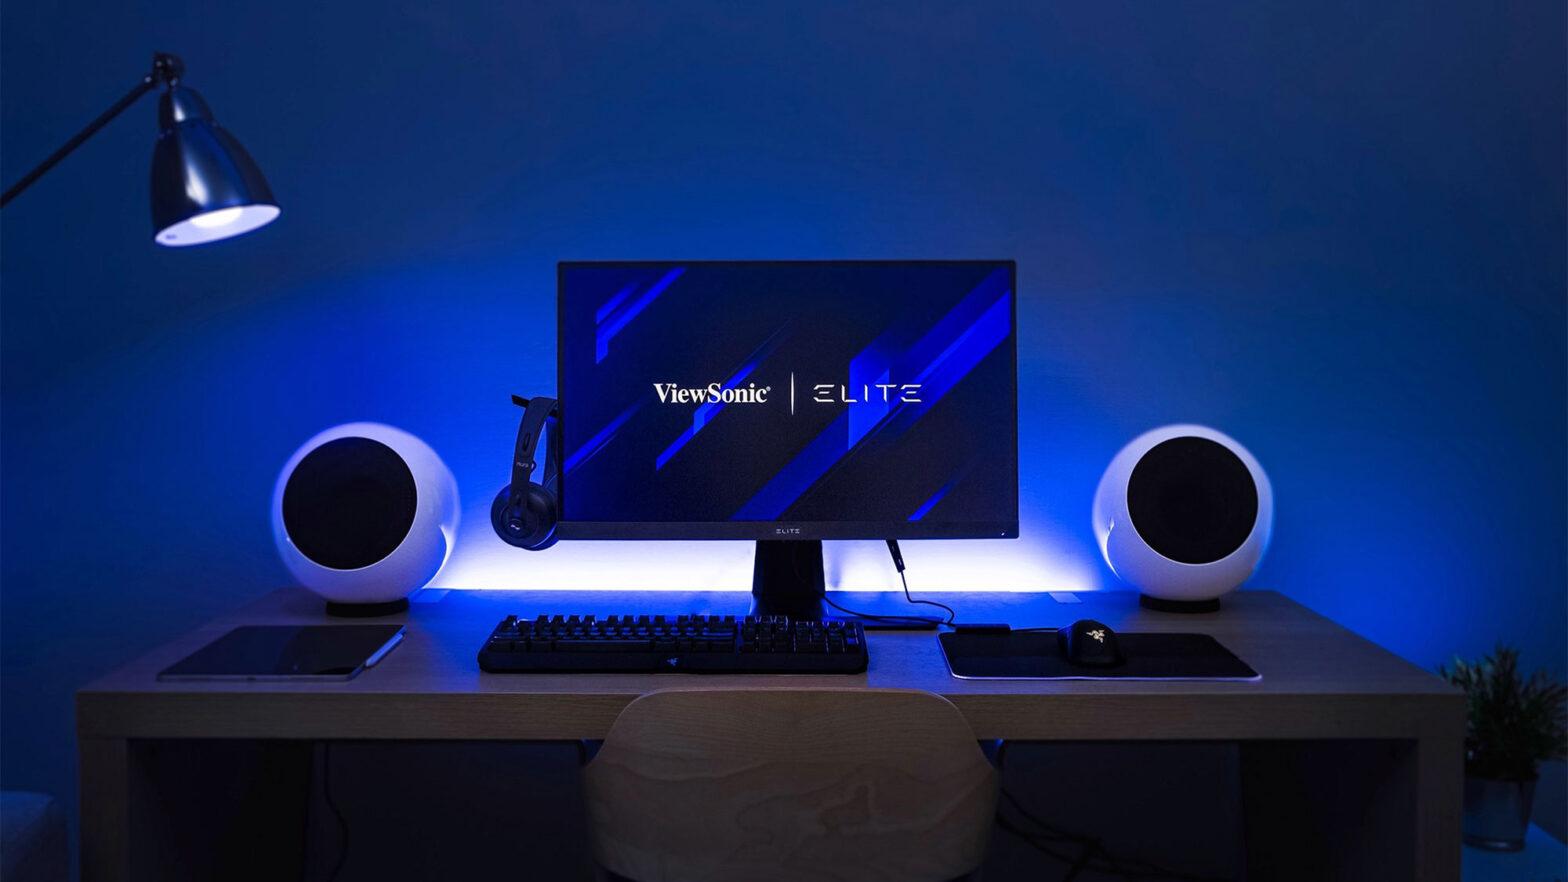 "ViewSonic ELITE 32"" Professional Gaming Monitors"